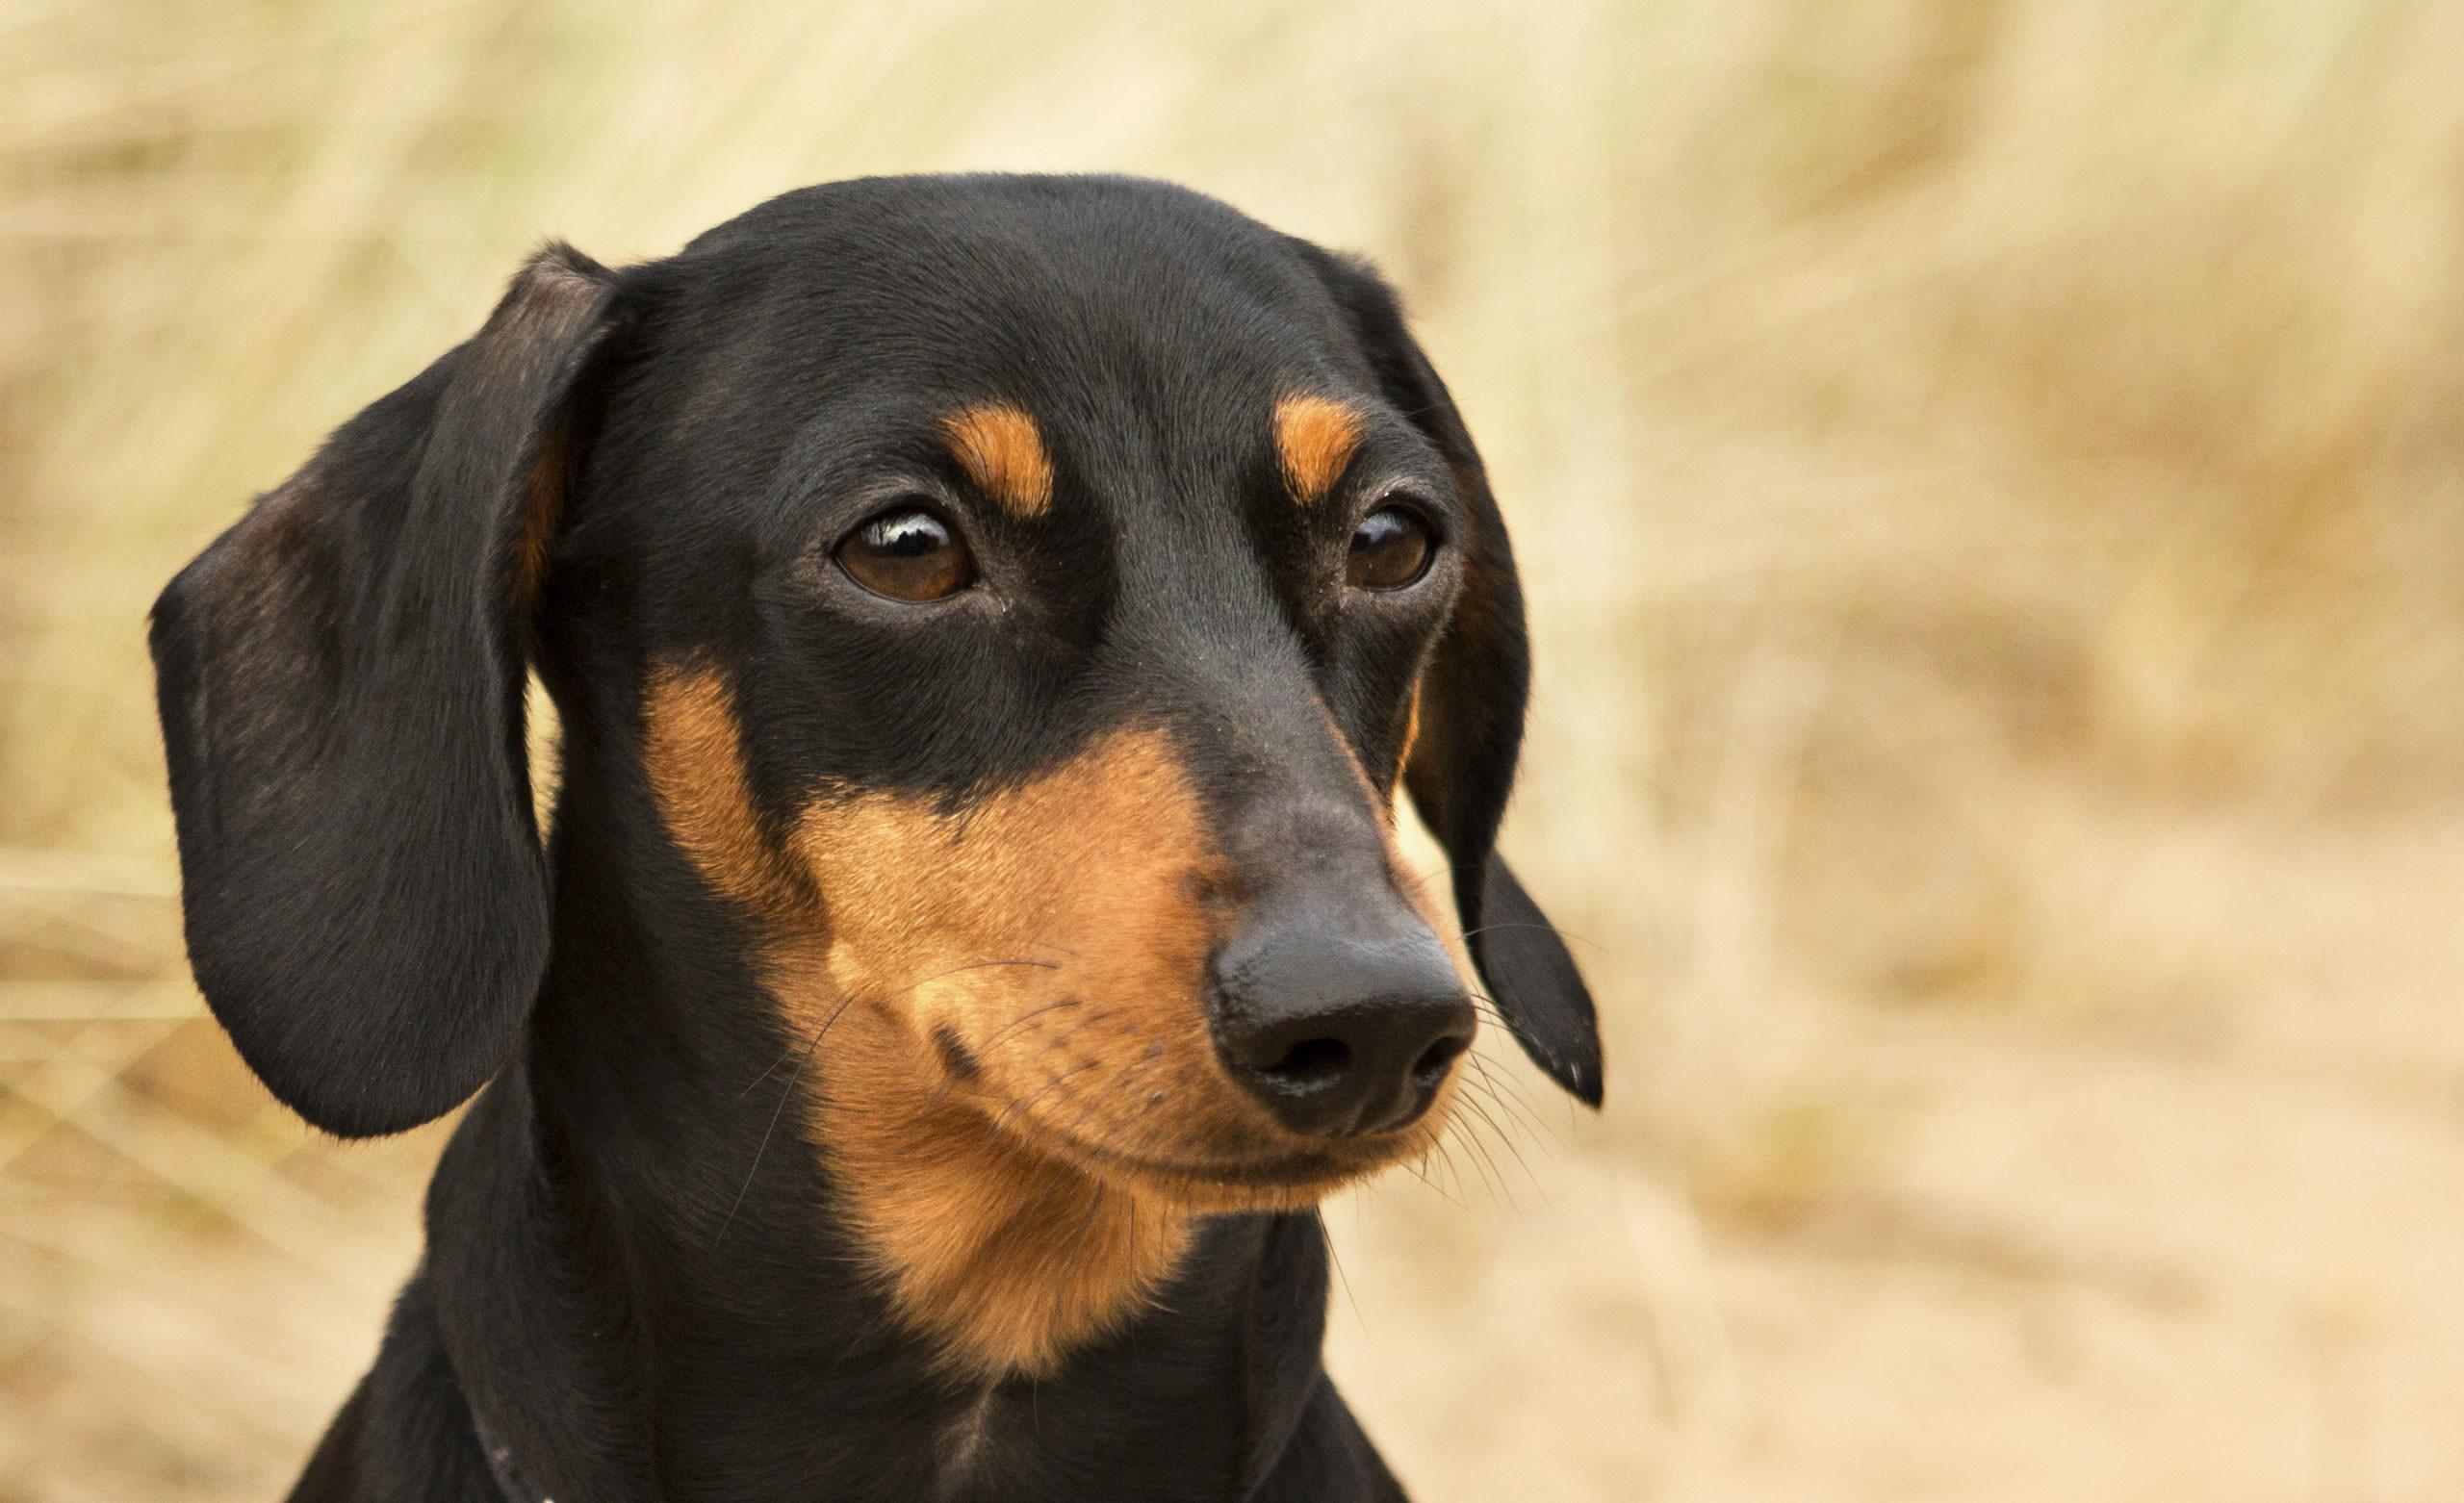 Weiner Dog Wallpaper 58 images 2560x1562